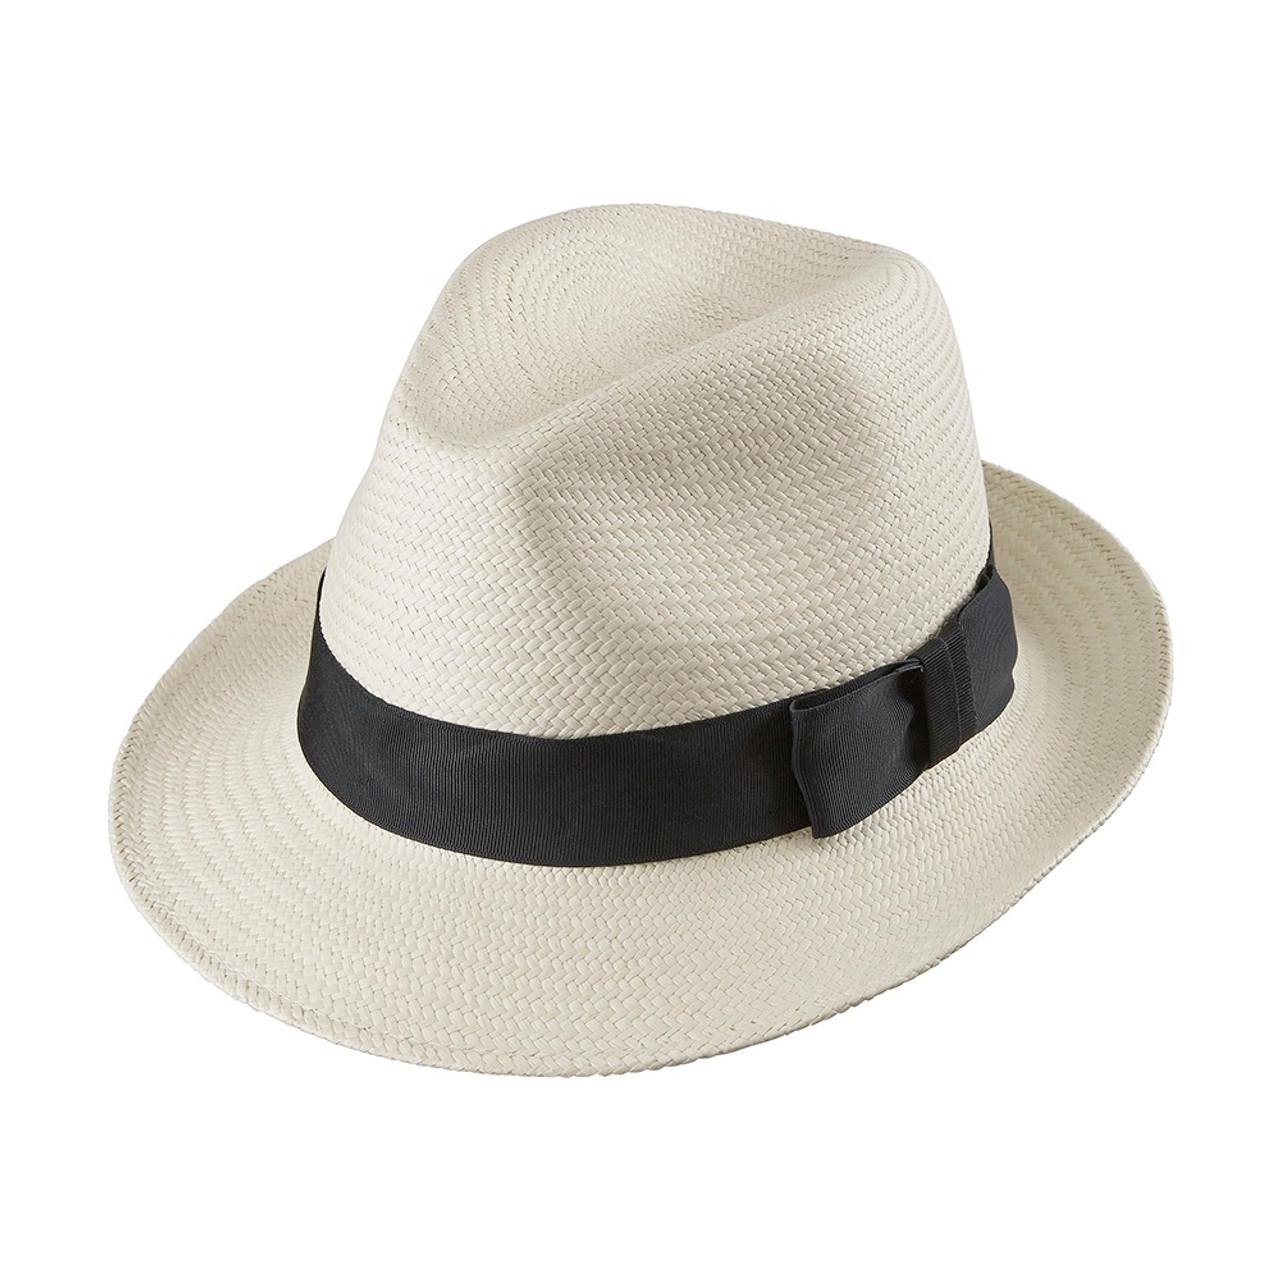 81d69343e77 Jack Trilby Panama Hat - The Panama Hat Company